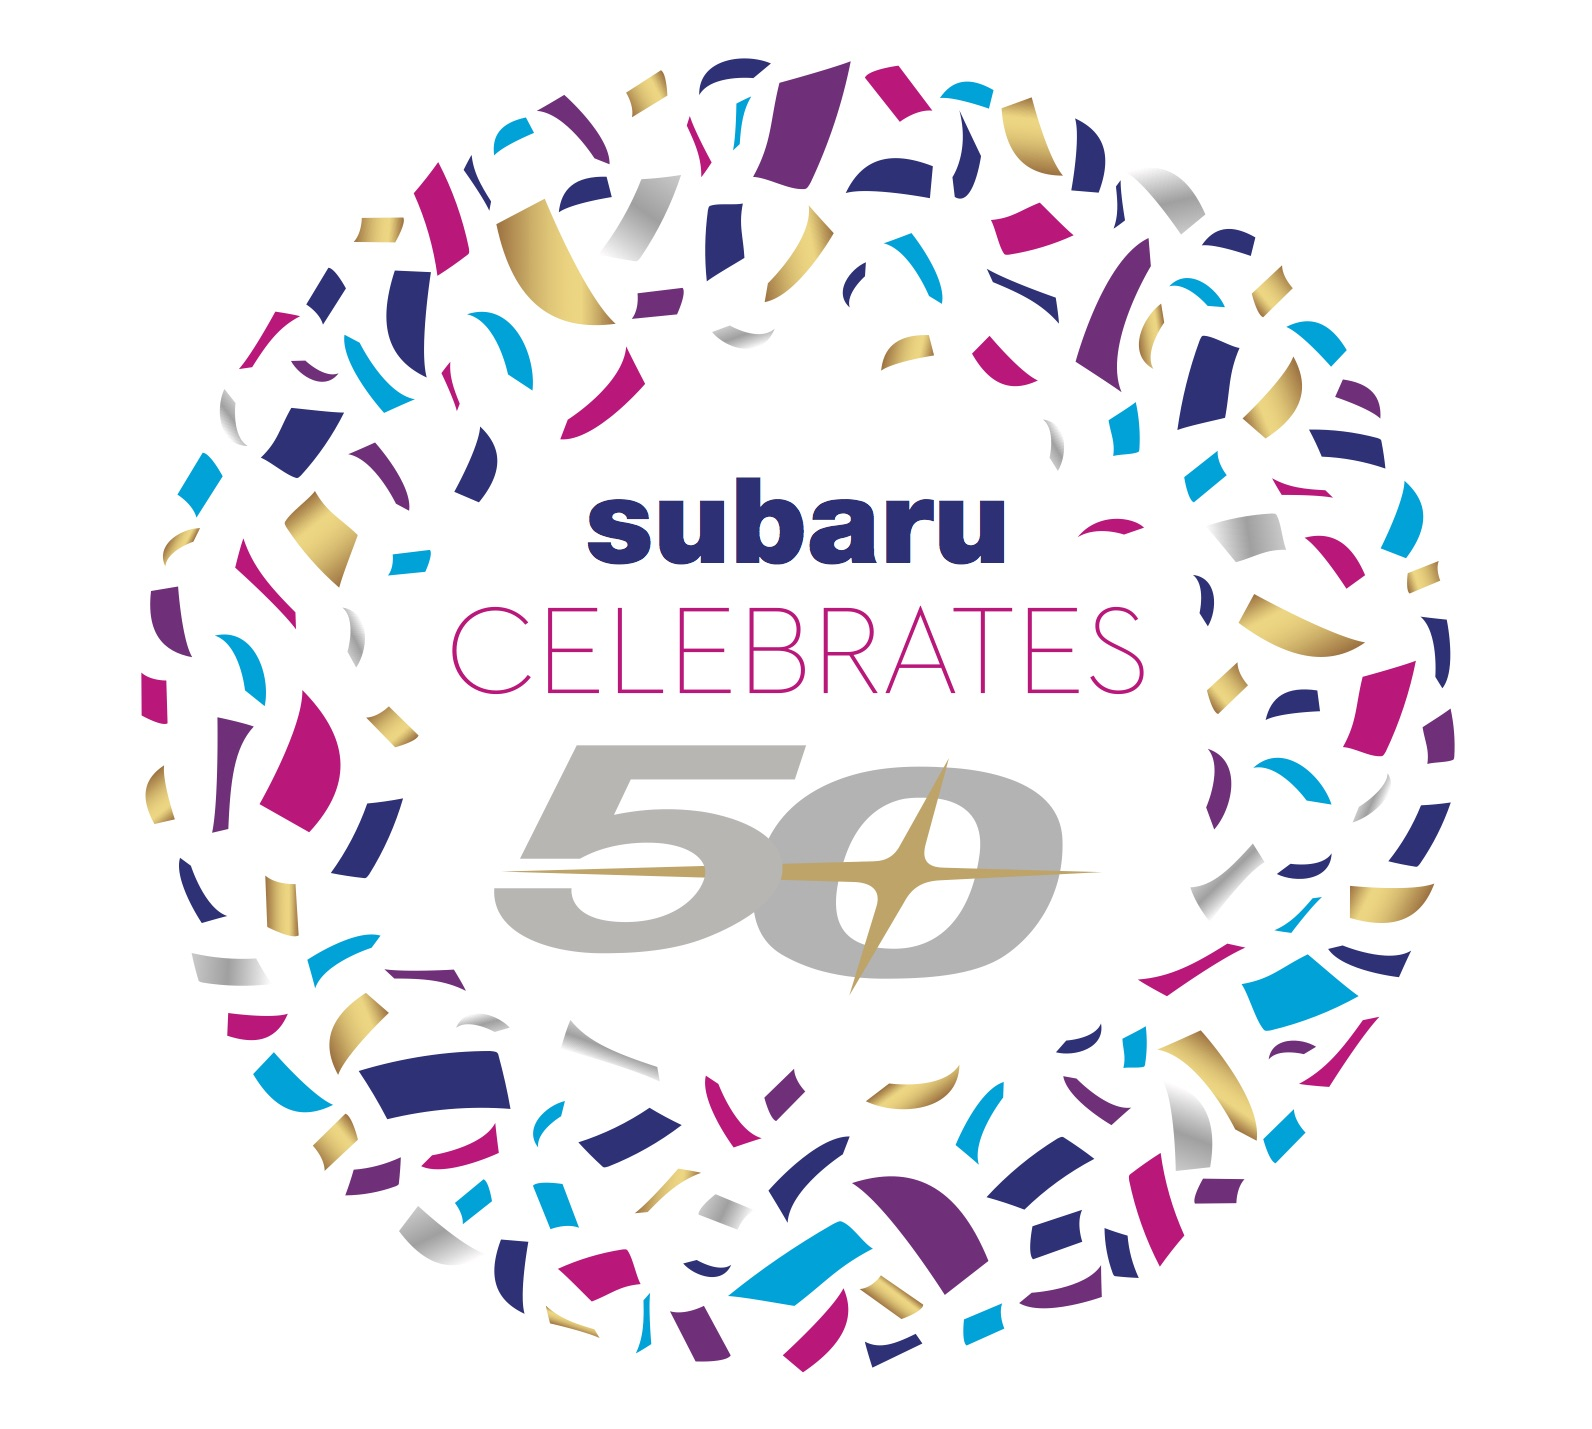 Subaru Celebrates Logo_FINAL.jpg